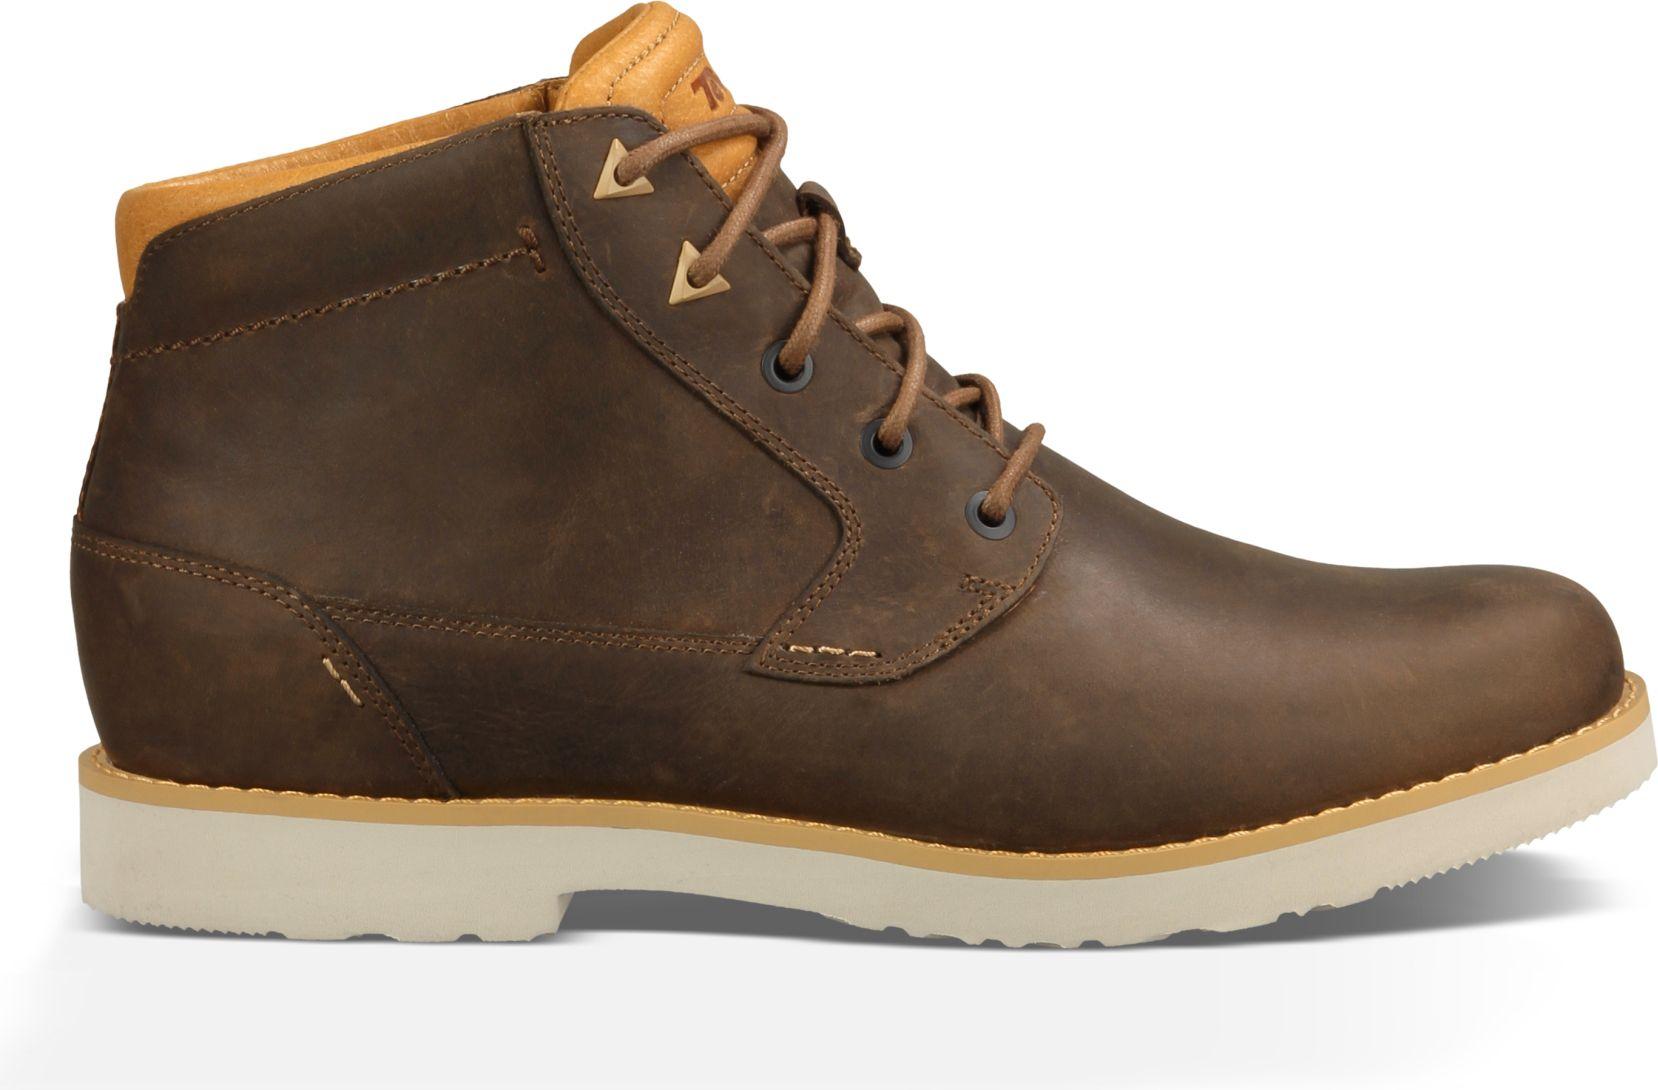 TEVA Buty M'S Durban - Leather Brazowy r. 43 (1008302-BIS-10) 1008302-BIS-10